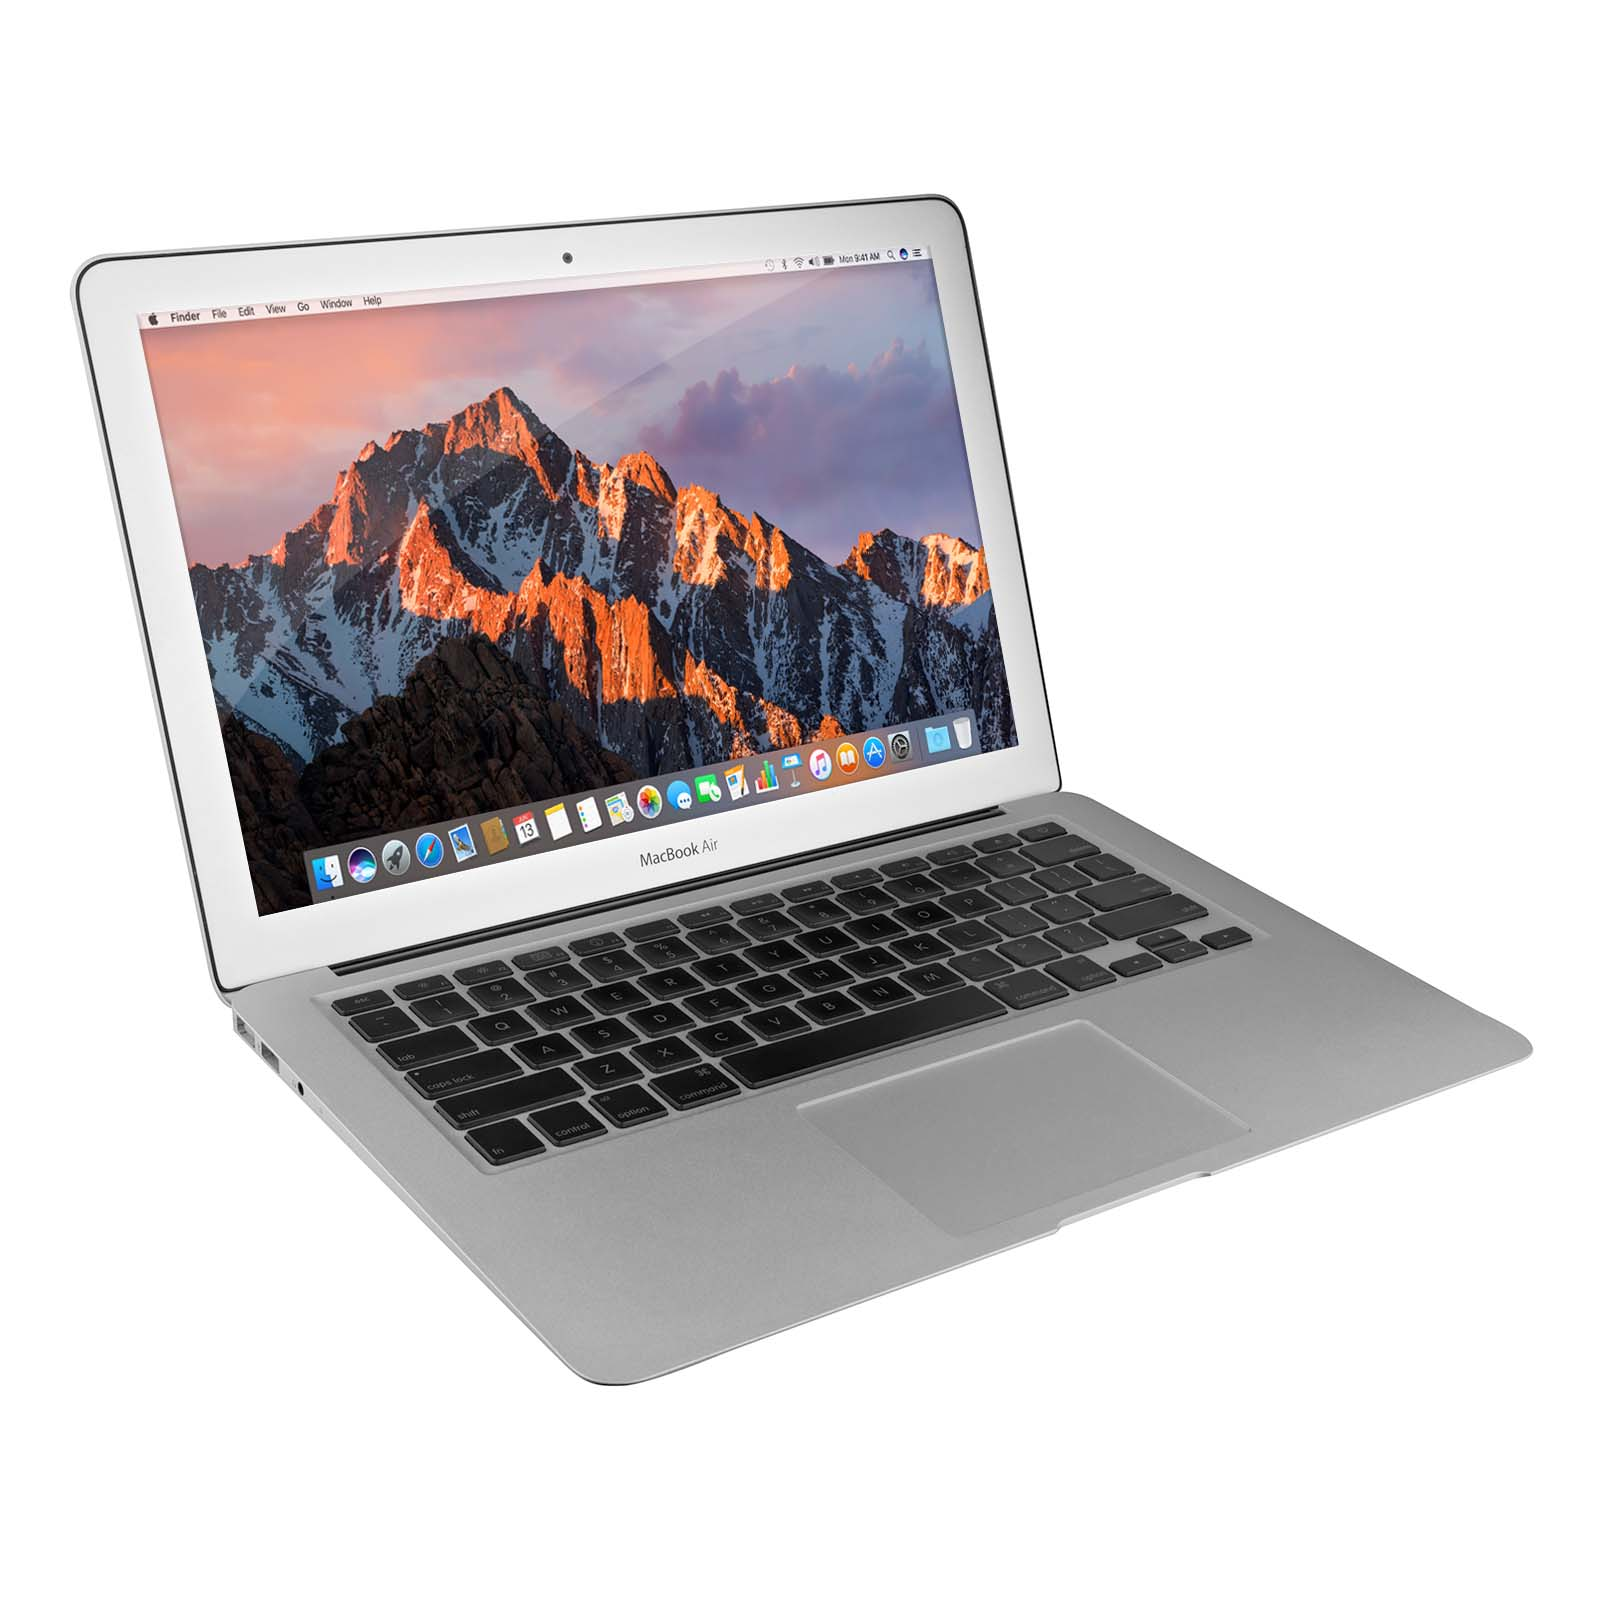 "Apple MacBook Air w/ 128GB Fast SSD HDD, 13.3"" Glossy LED Screen, Intel CPU"